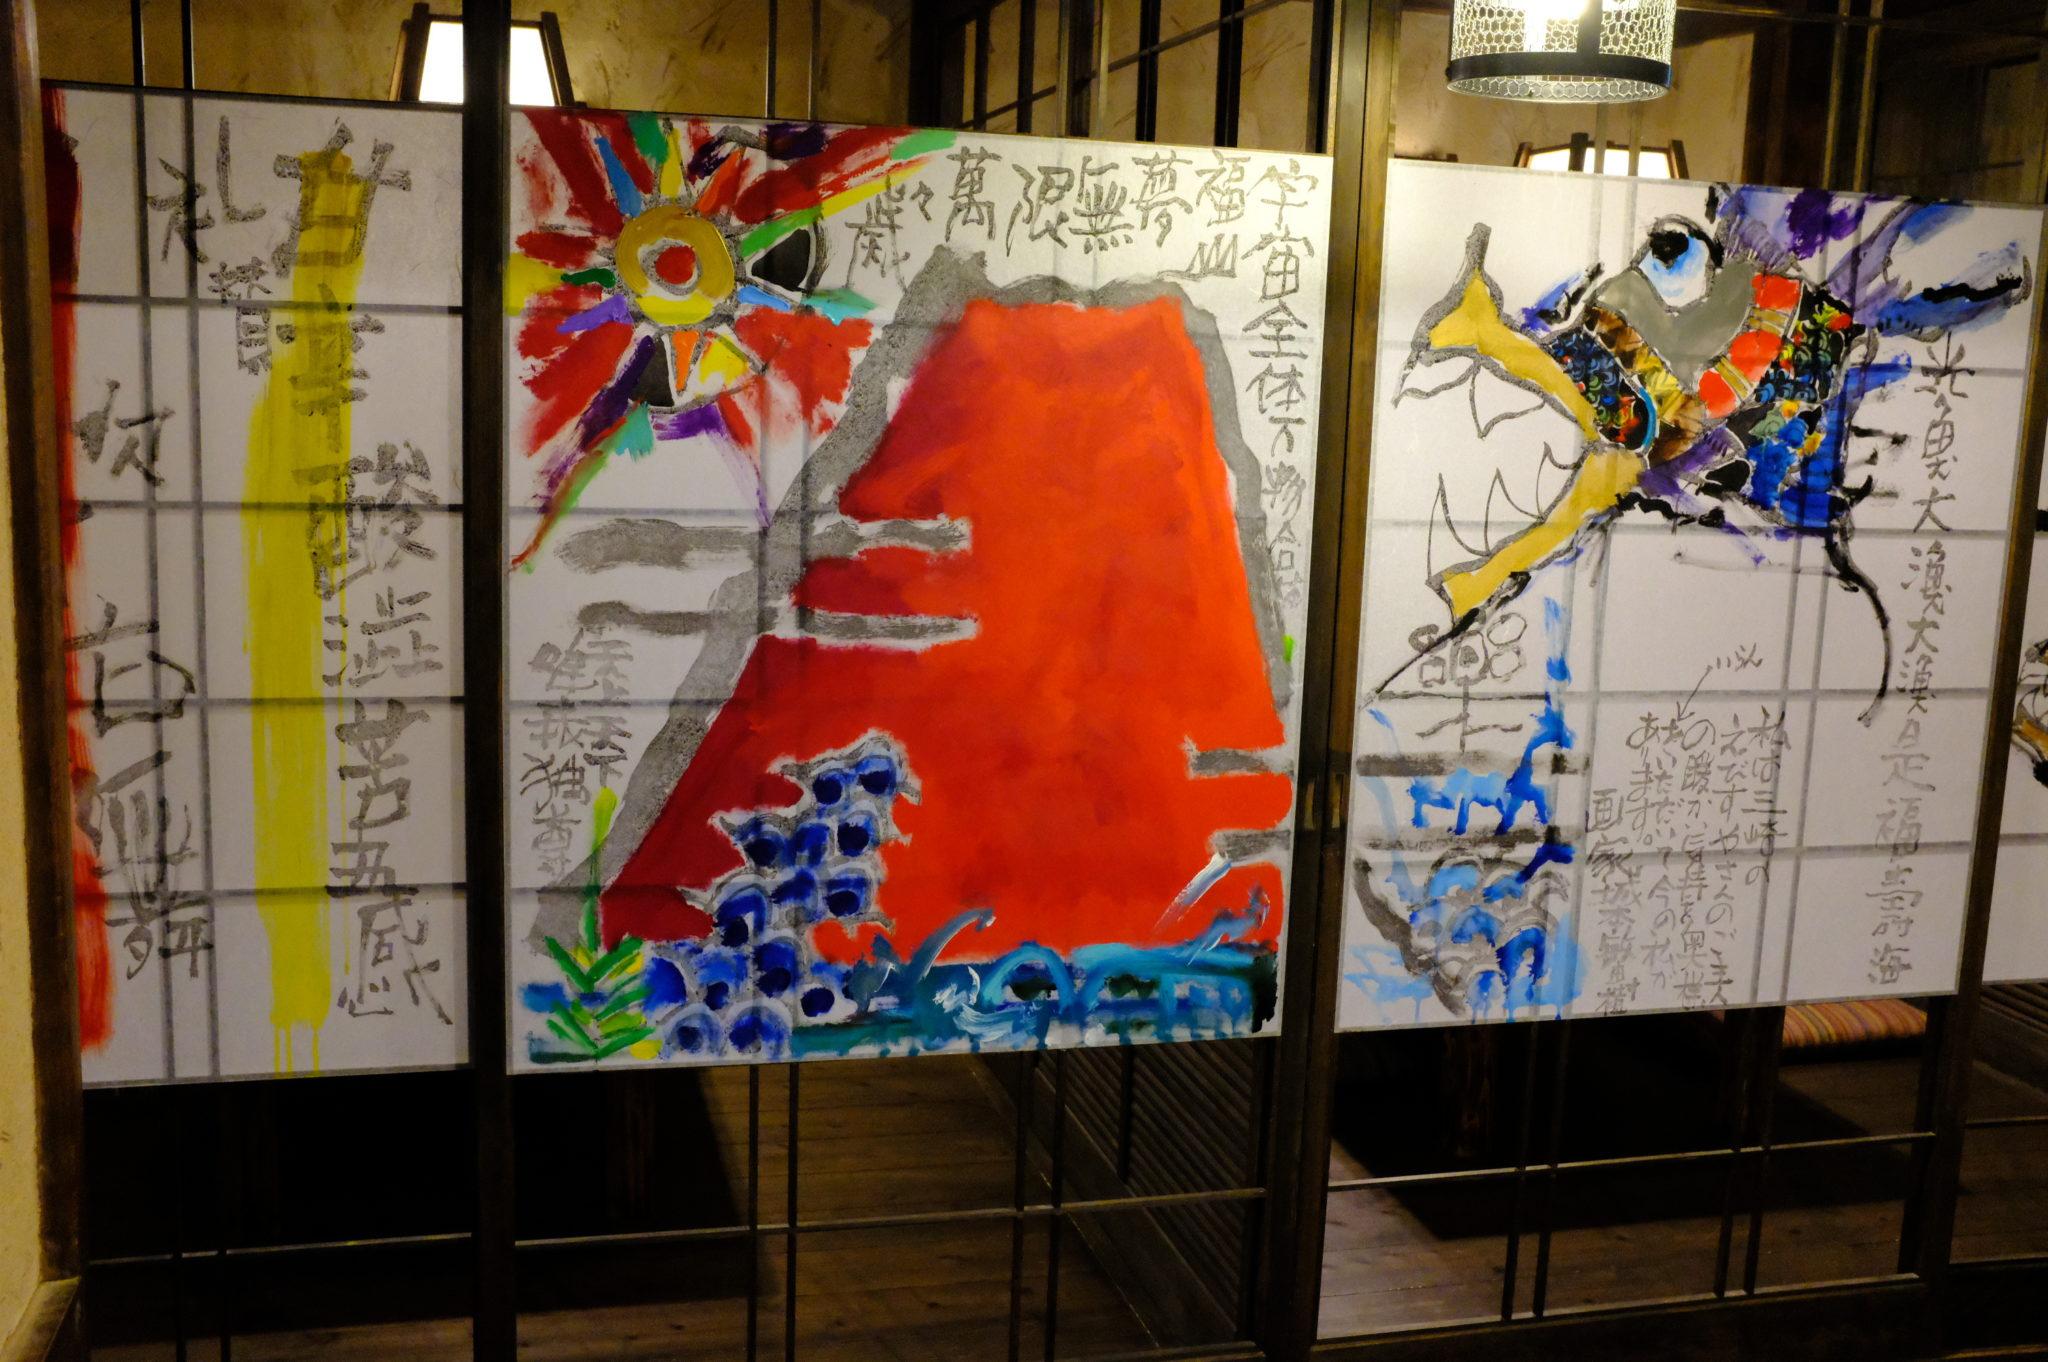 Japanische Papierschiebewand